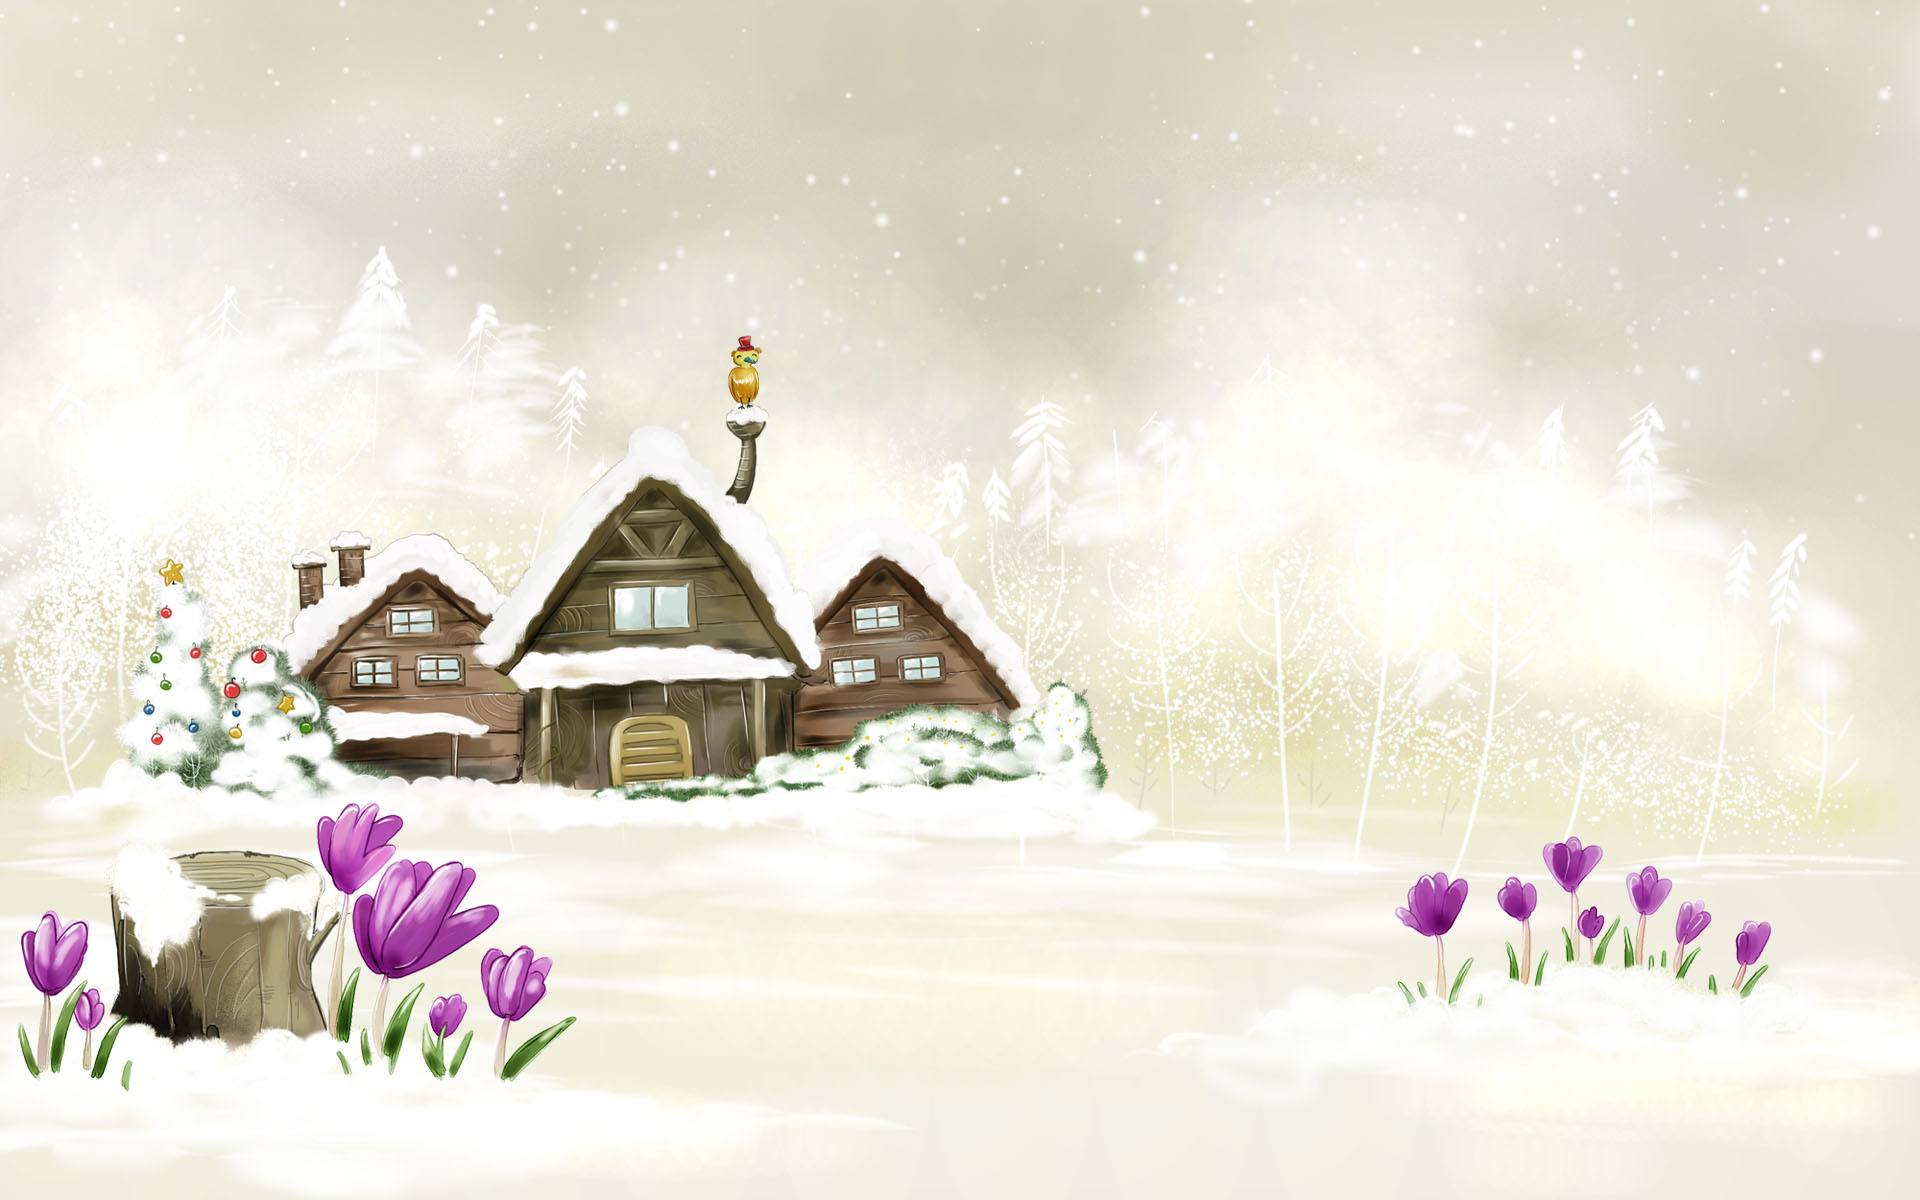 Christmas Winter Wallpaper 027